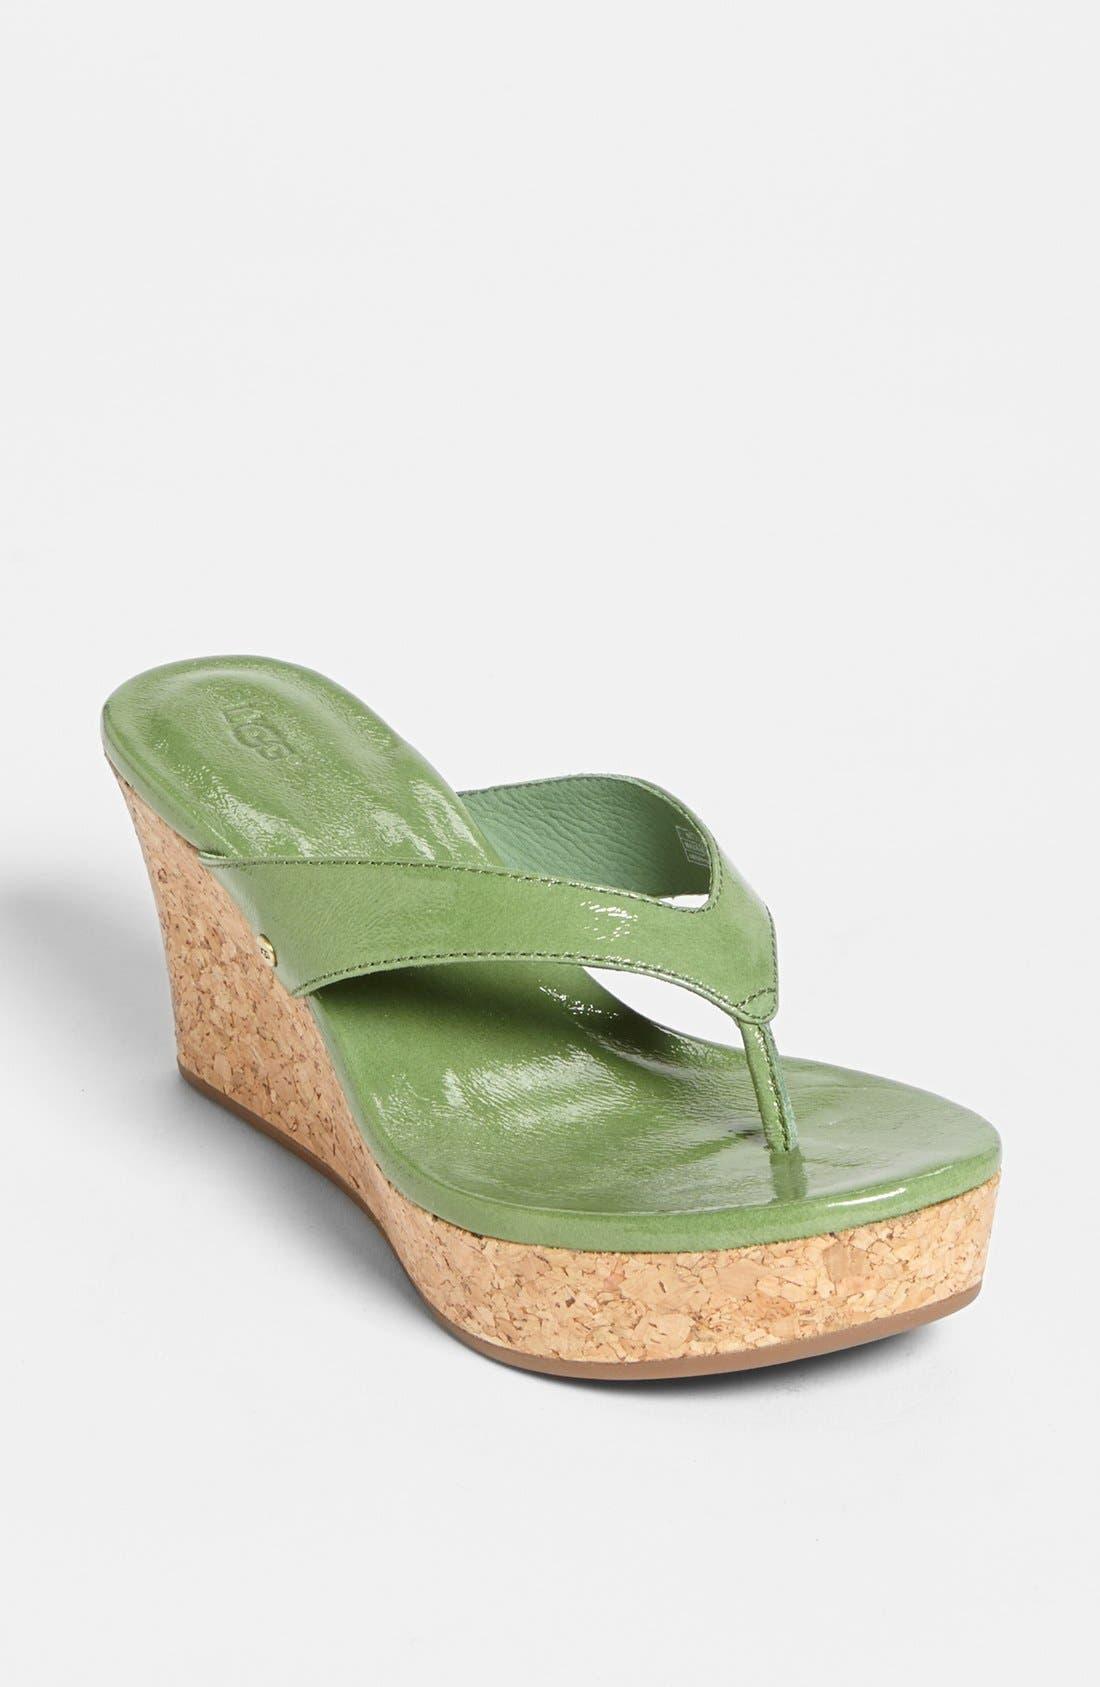 Alternate Image 1 Selected - UGG® Australia 'Natassia' Sandal